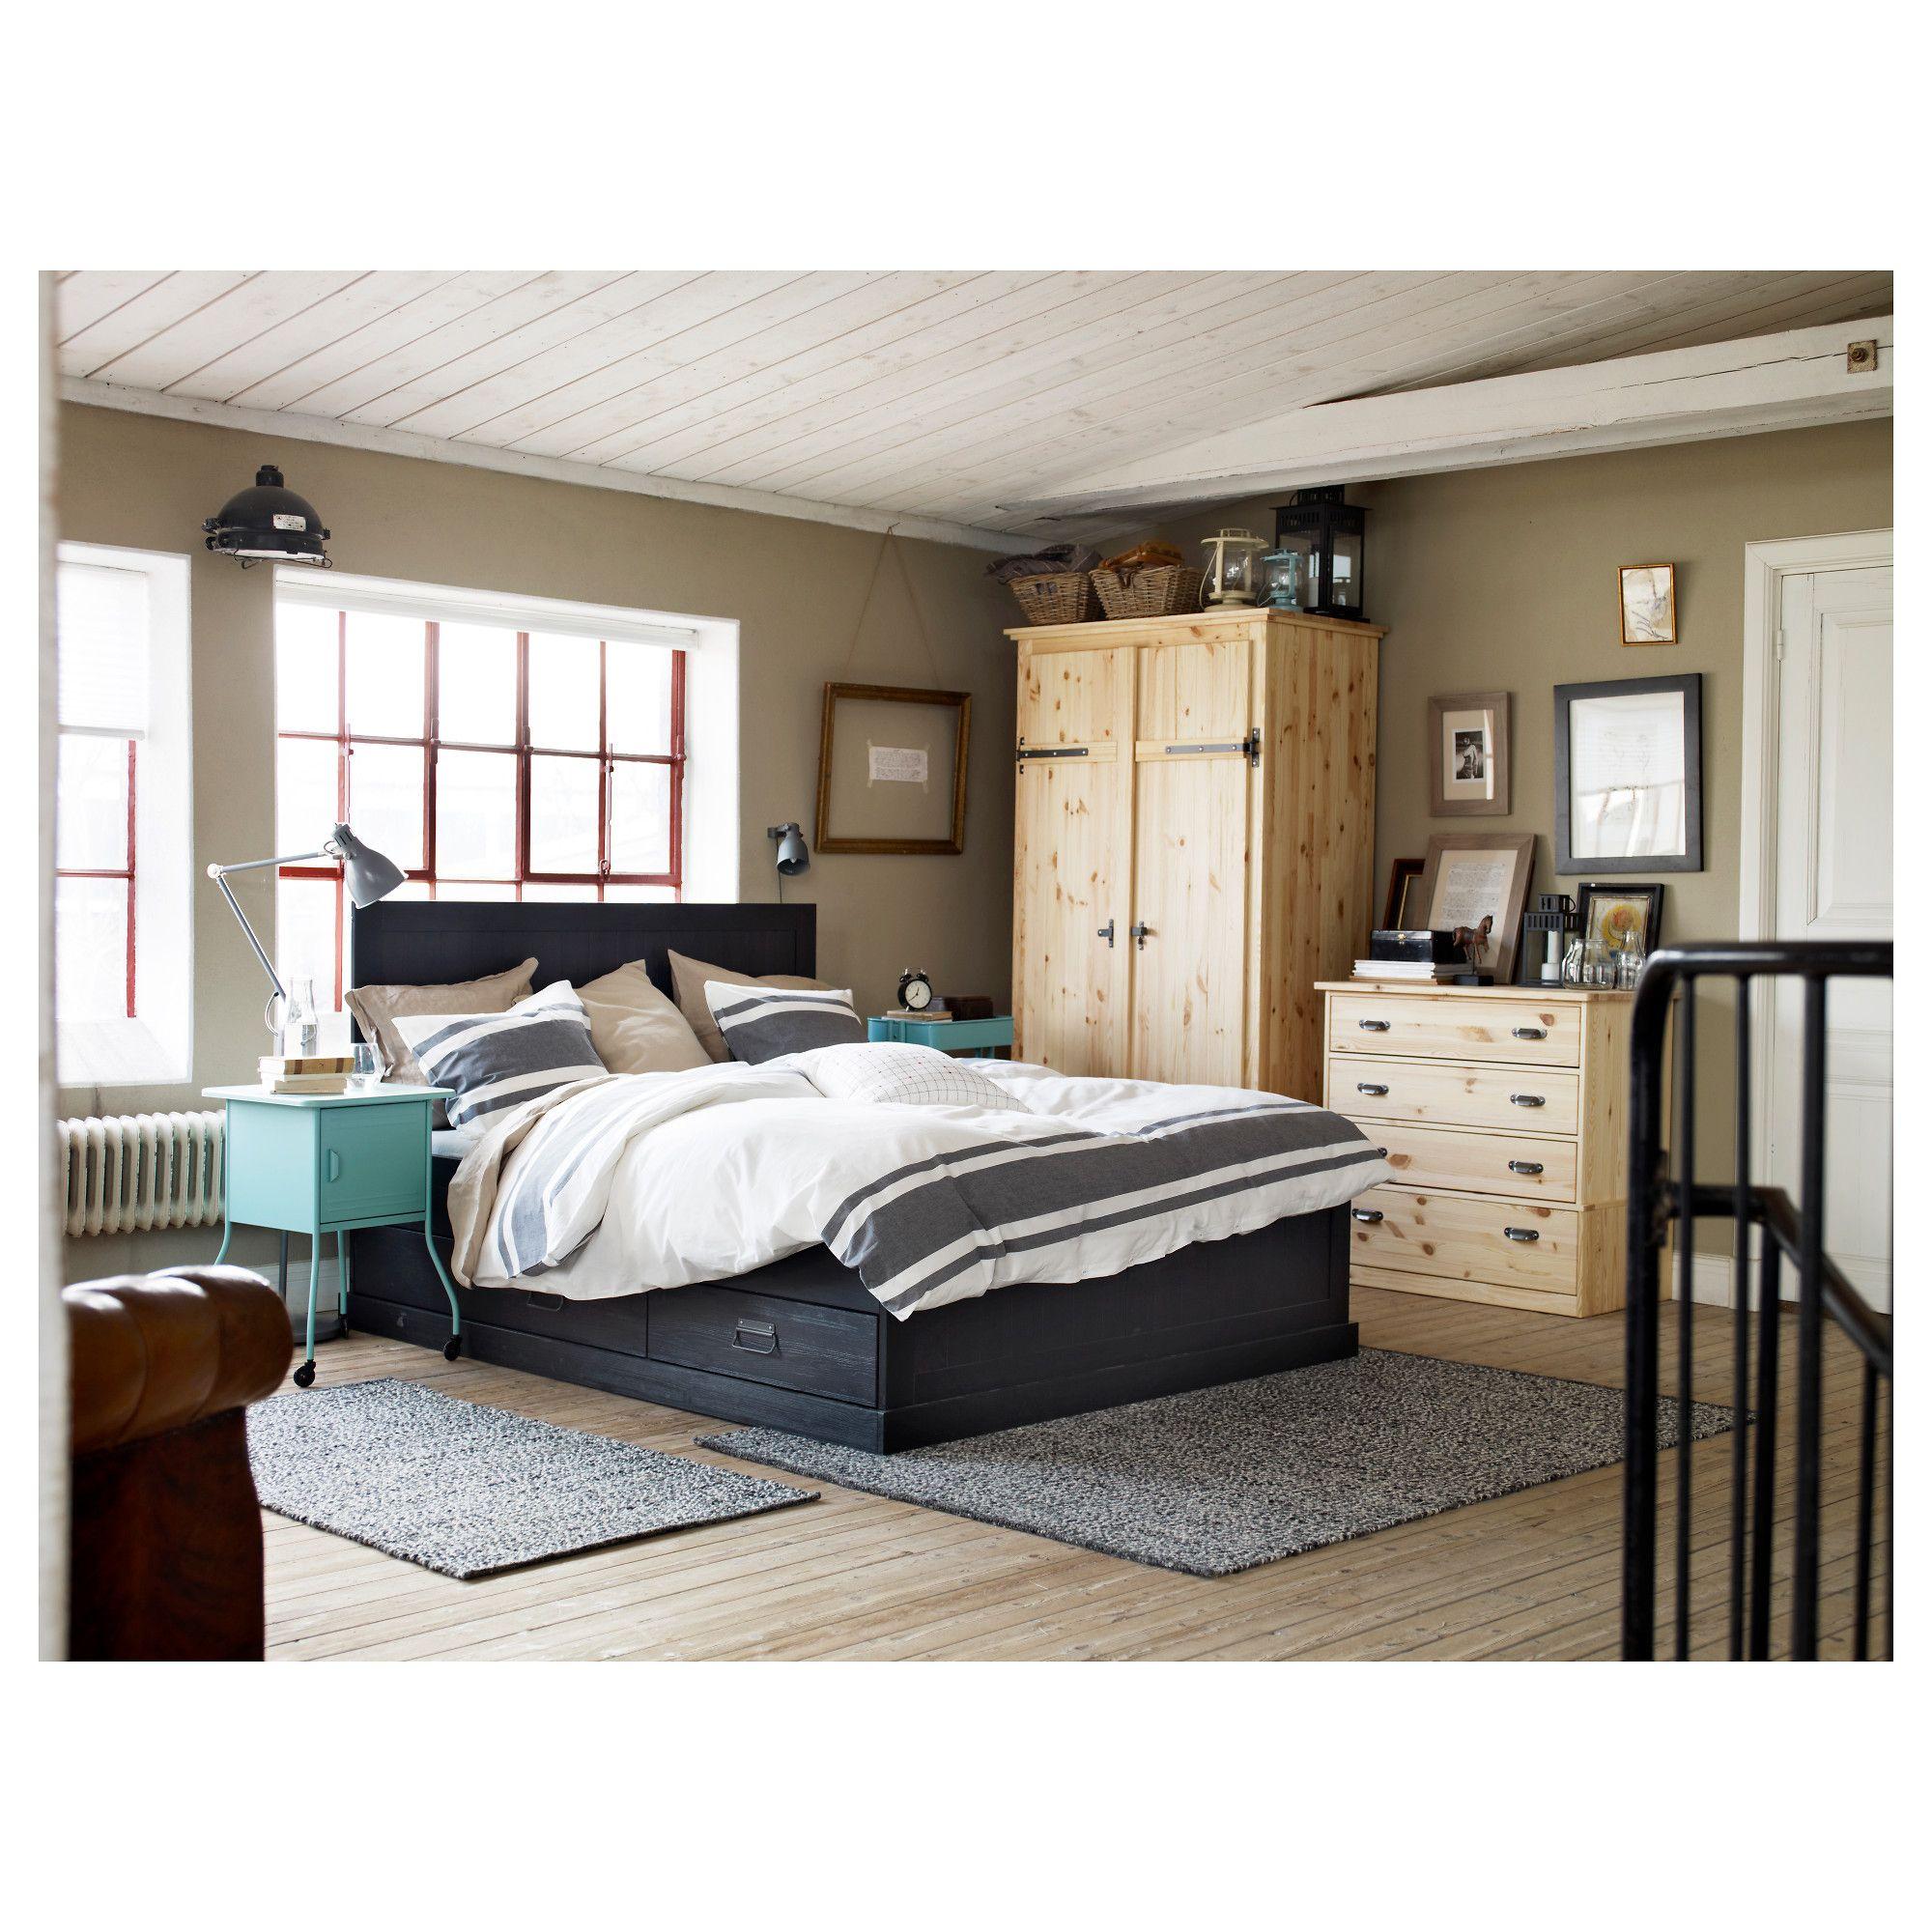 furniture and home furnishings in 2019 ikea ikea bedroom rh pinterest com